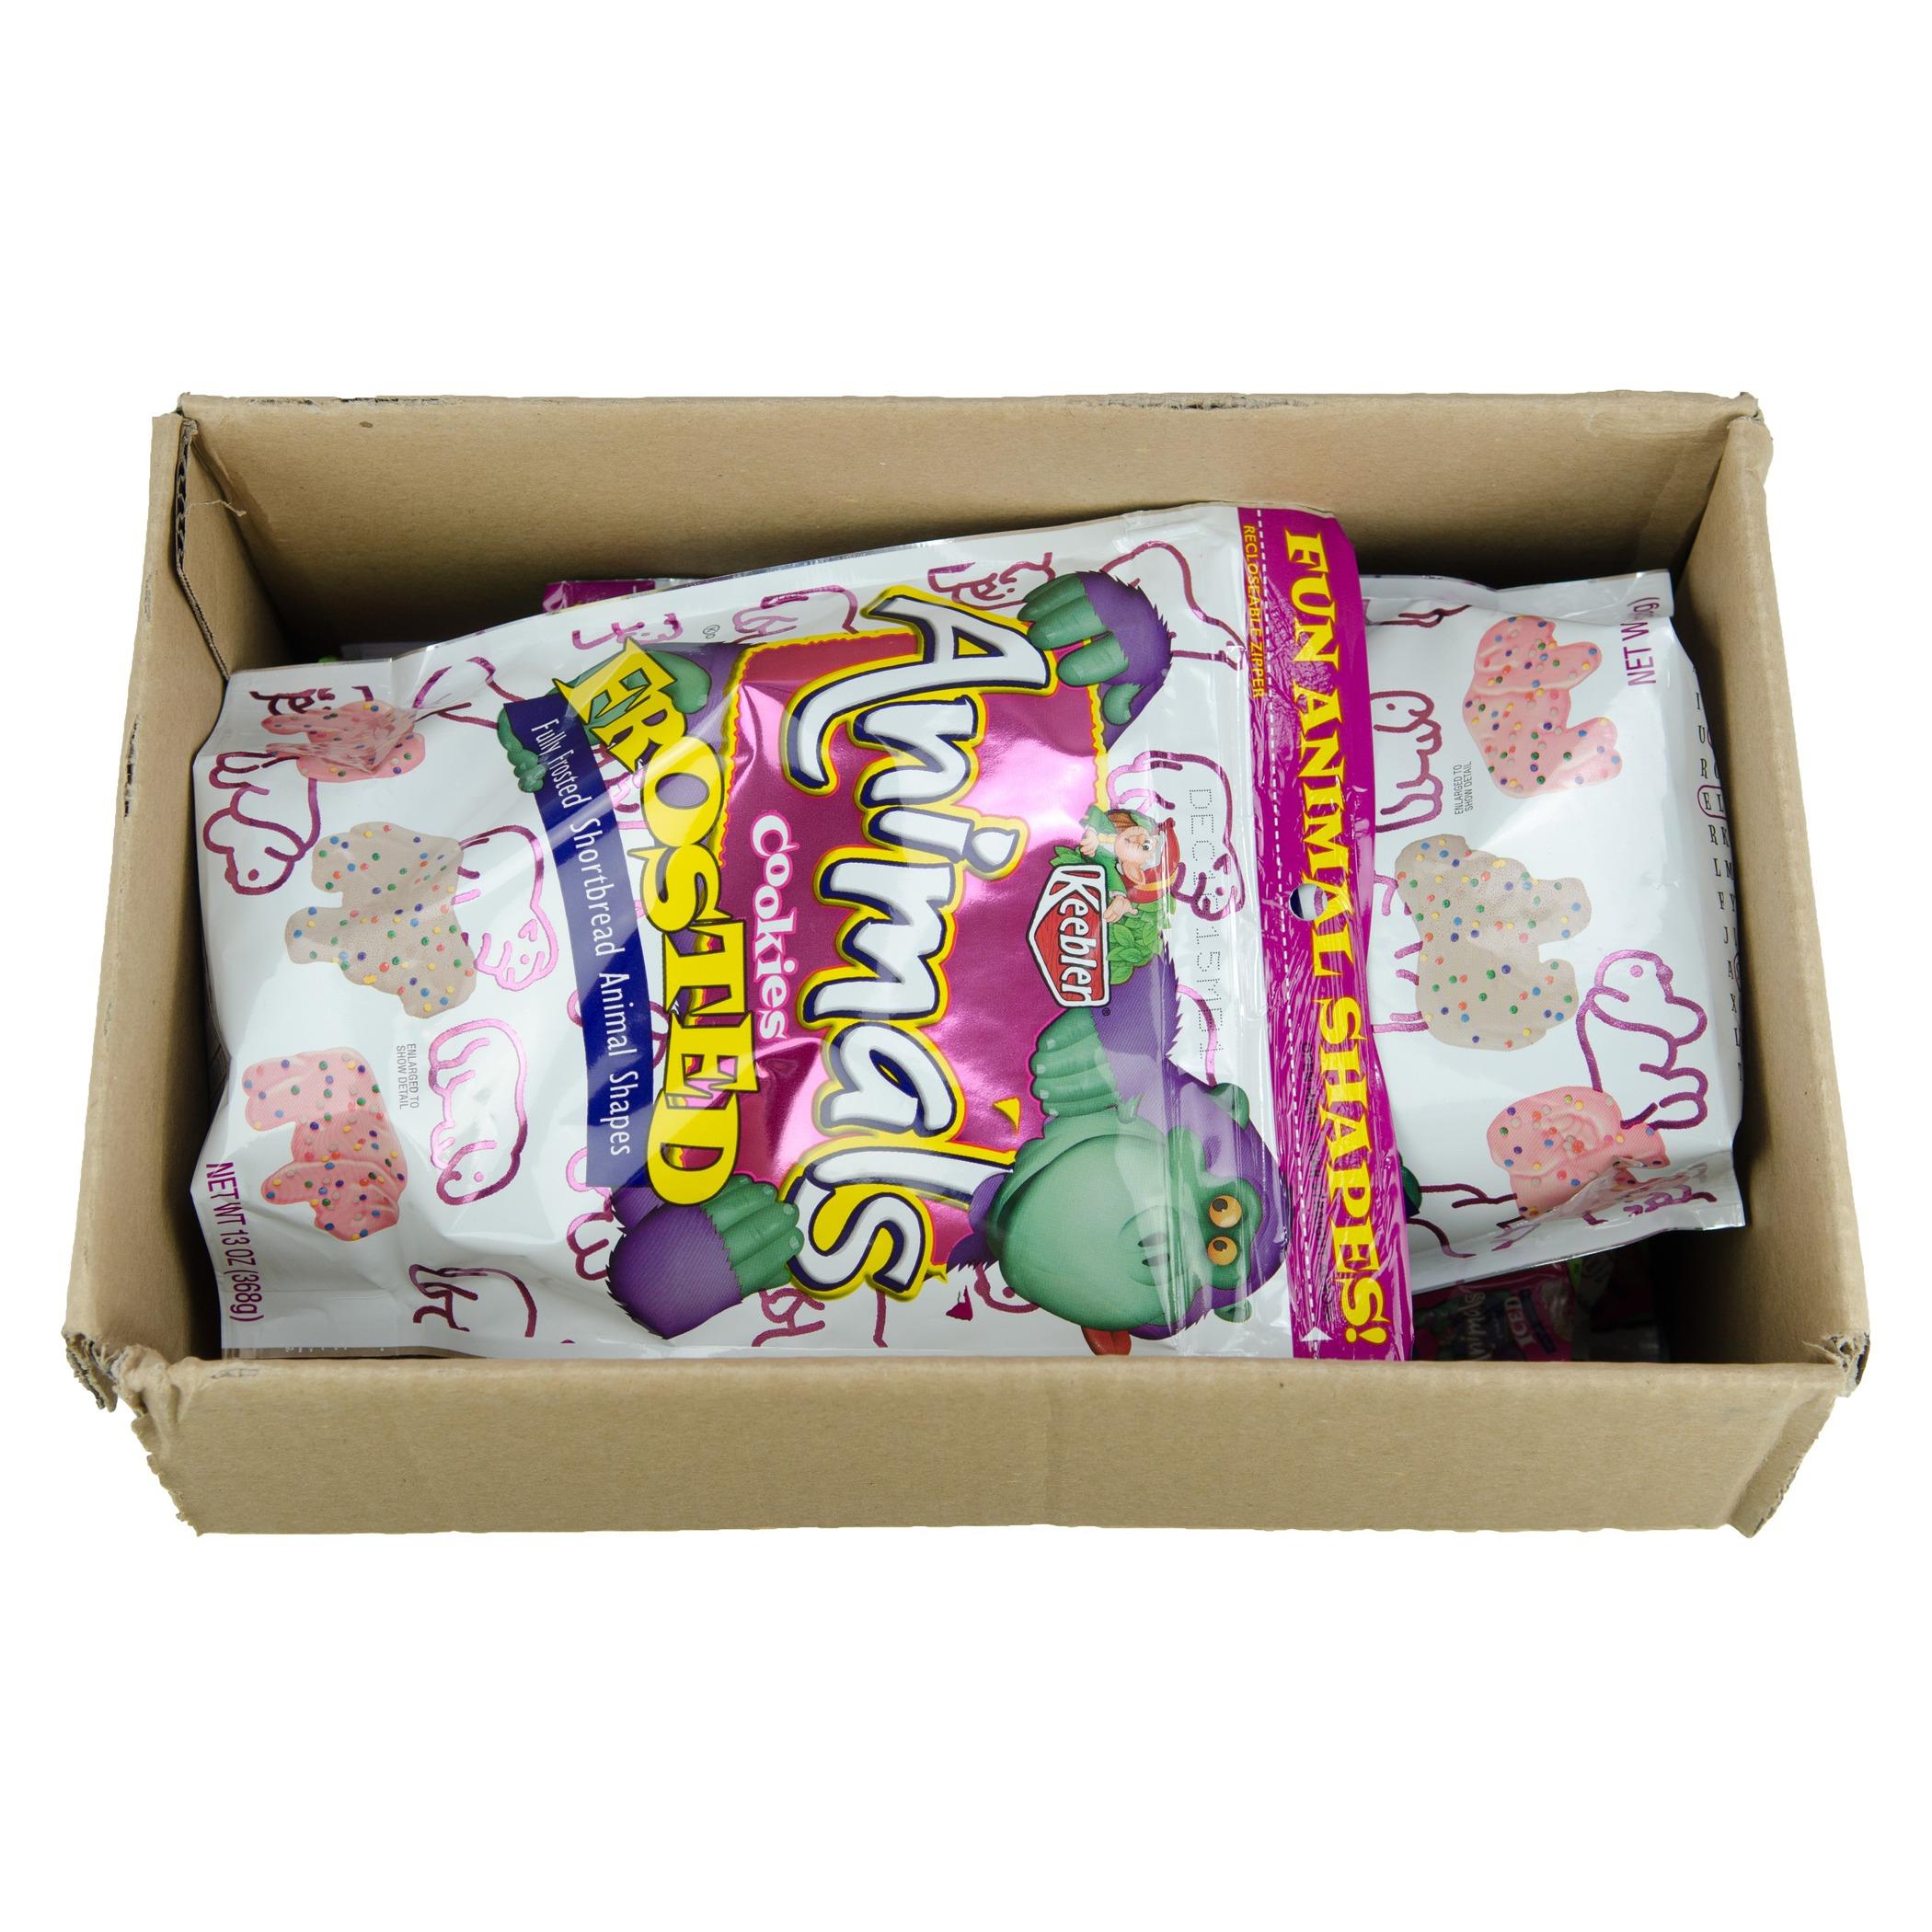 barnum animal crackers box bulk